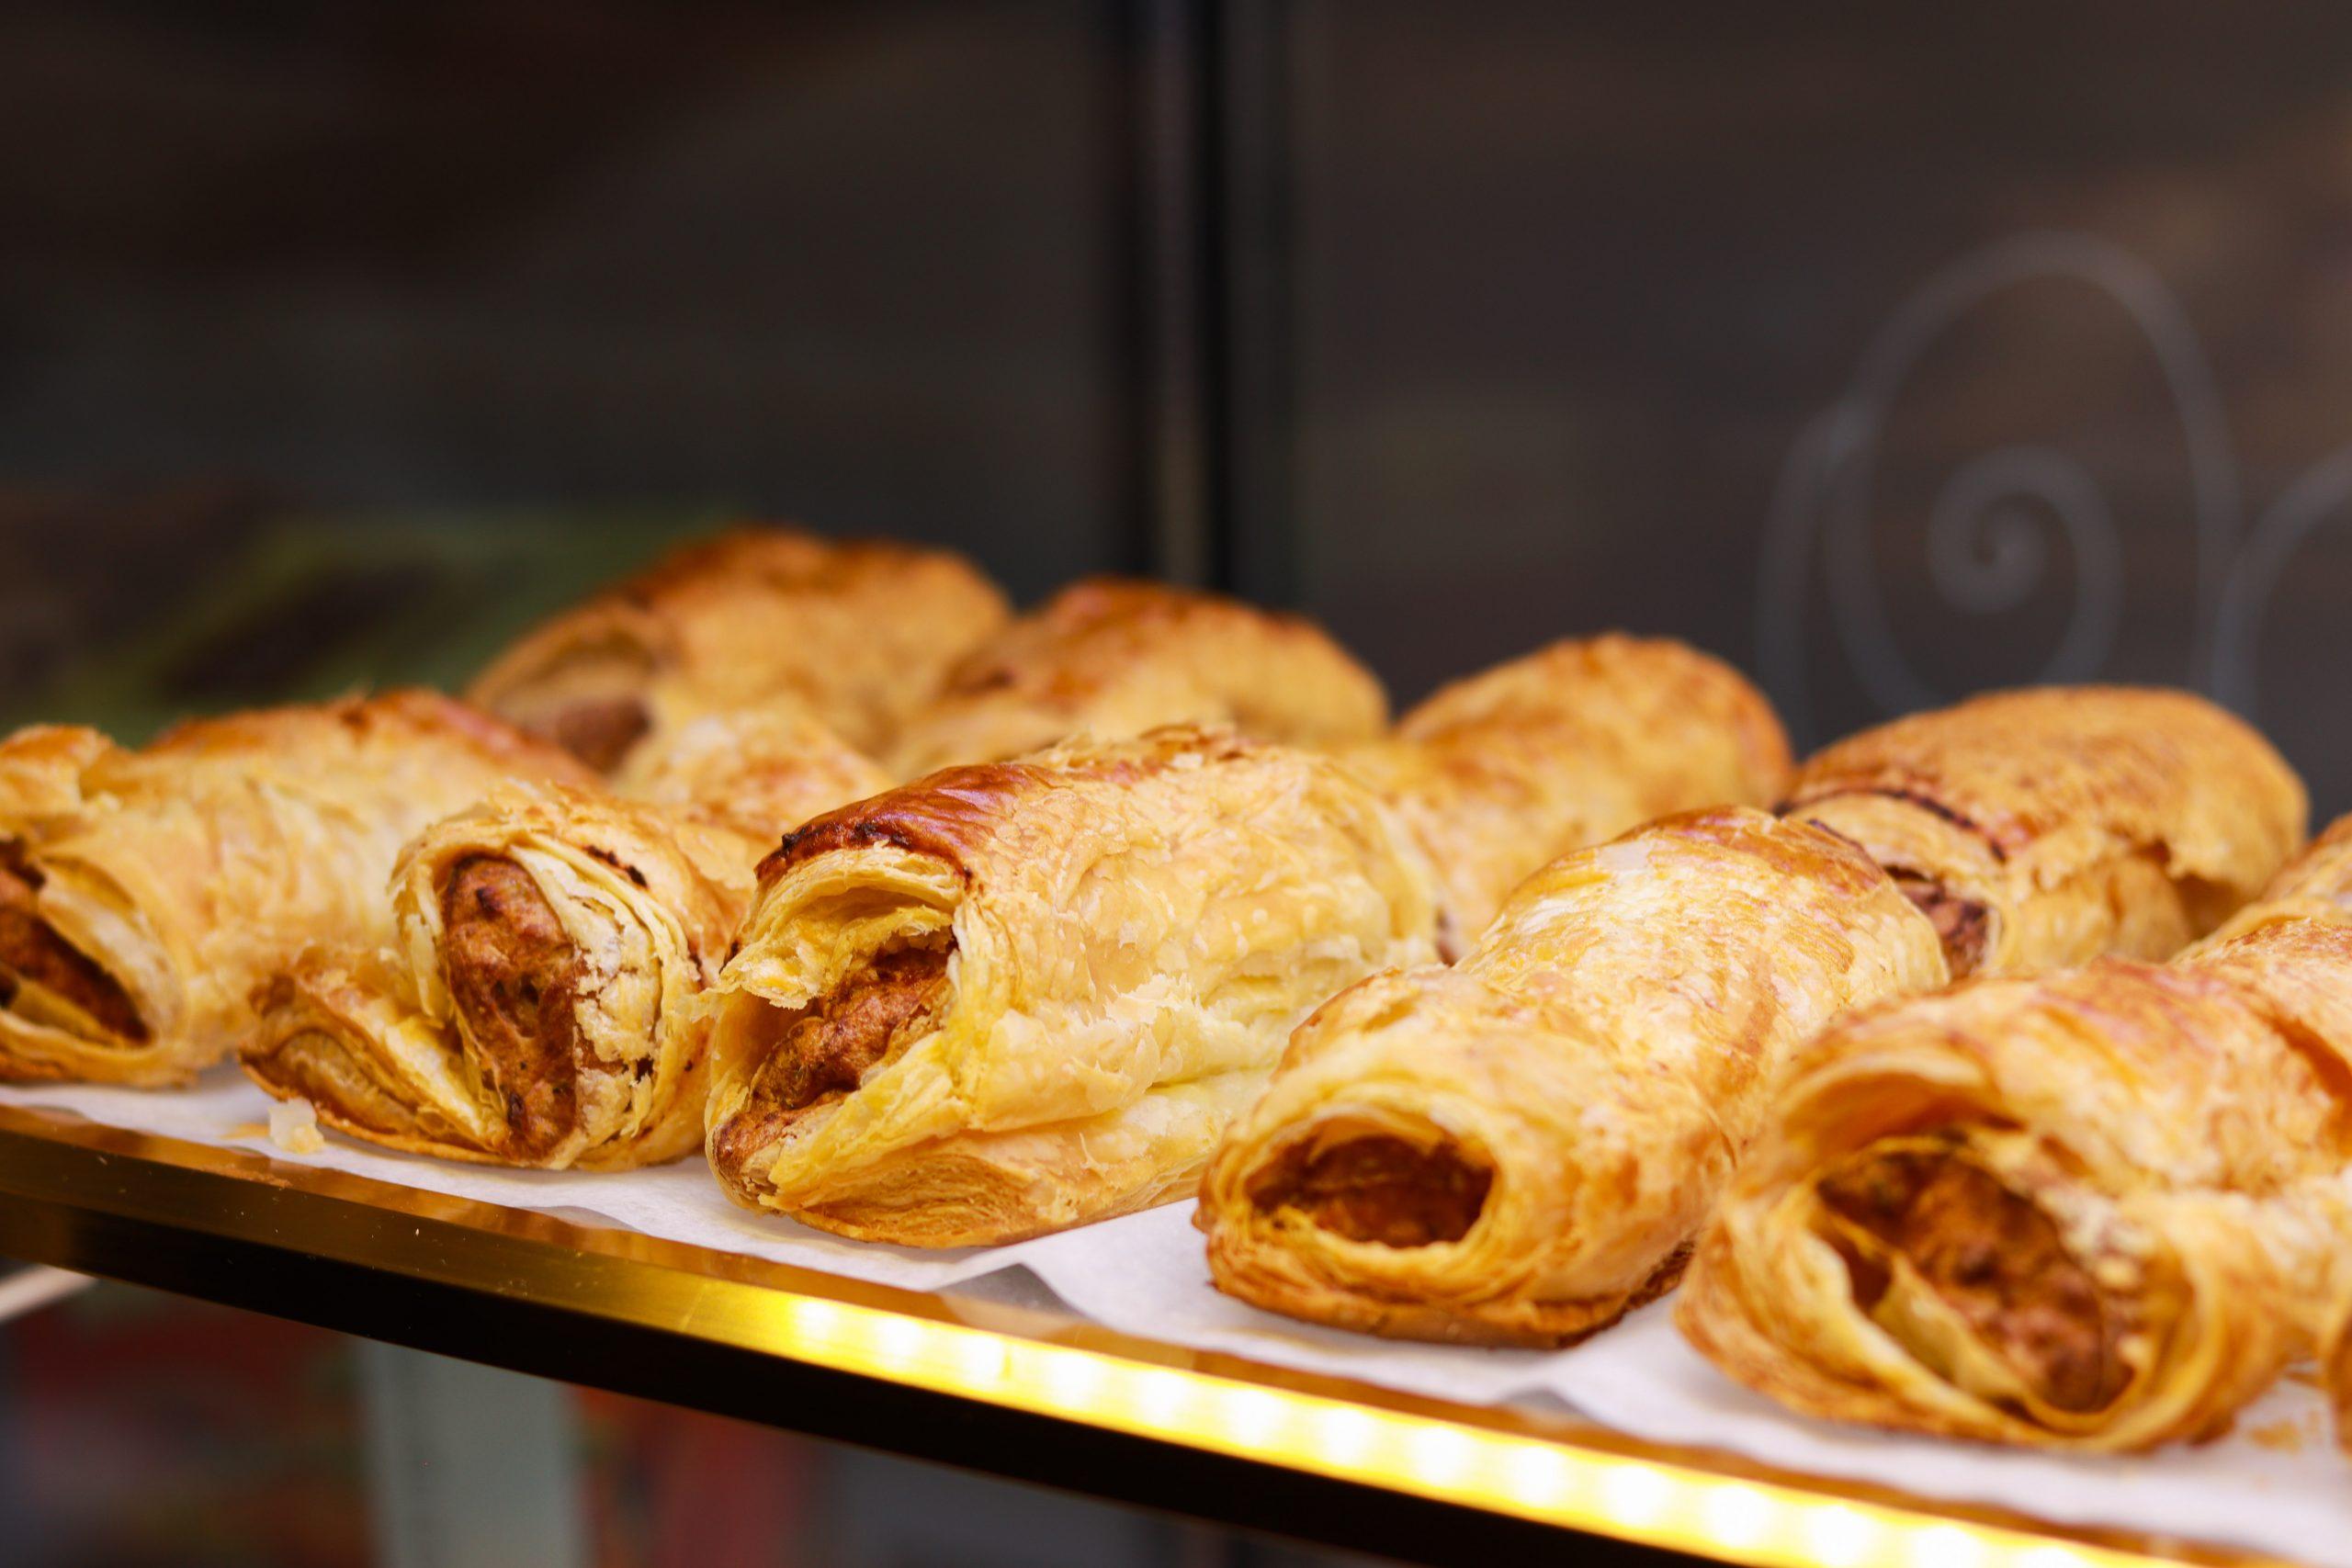 Sausage rolls wt pastry bar